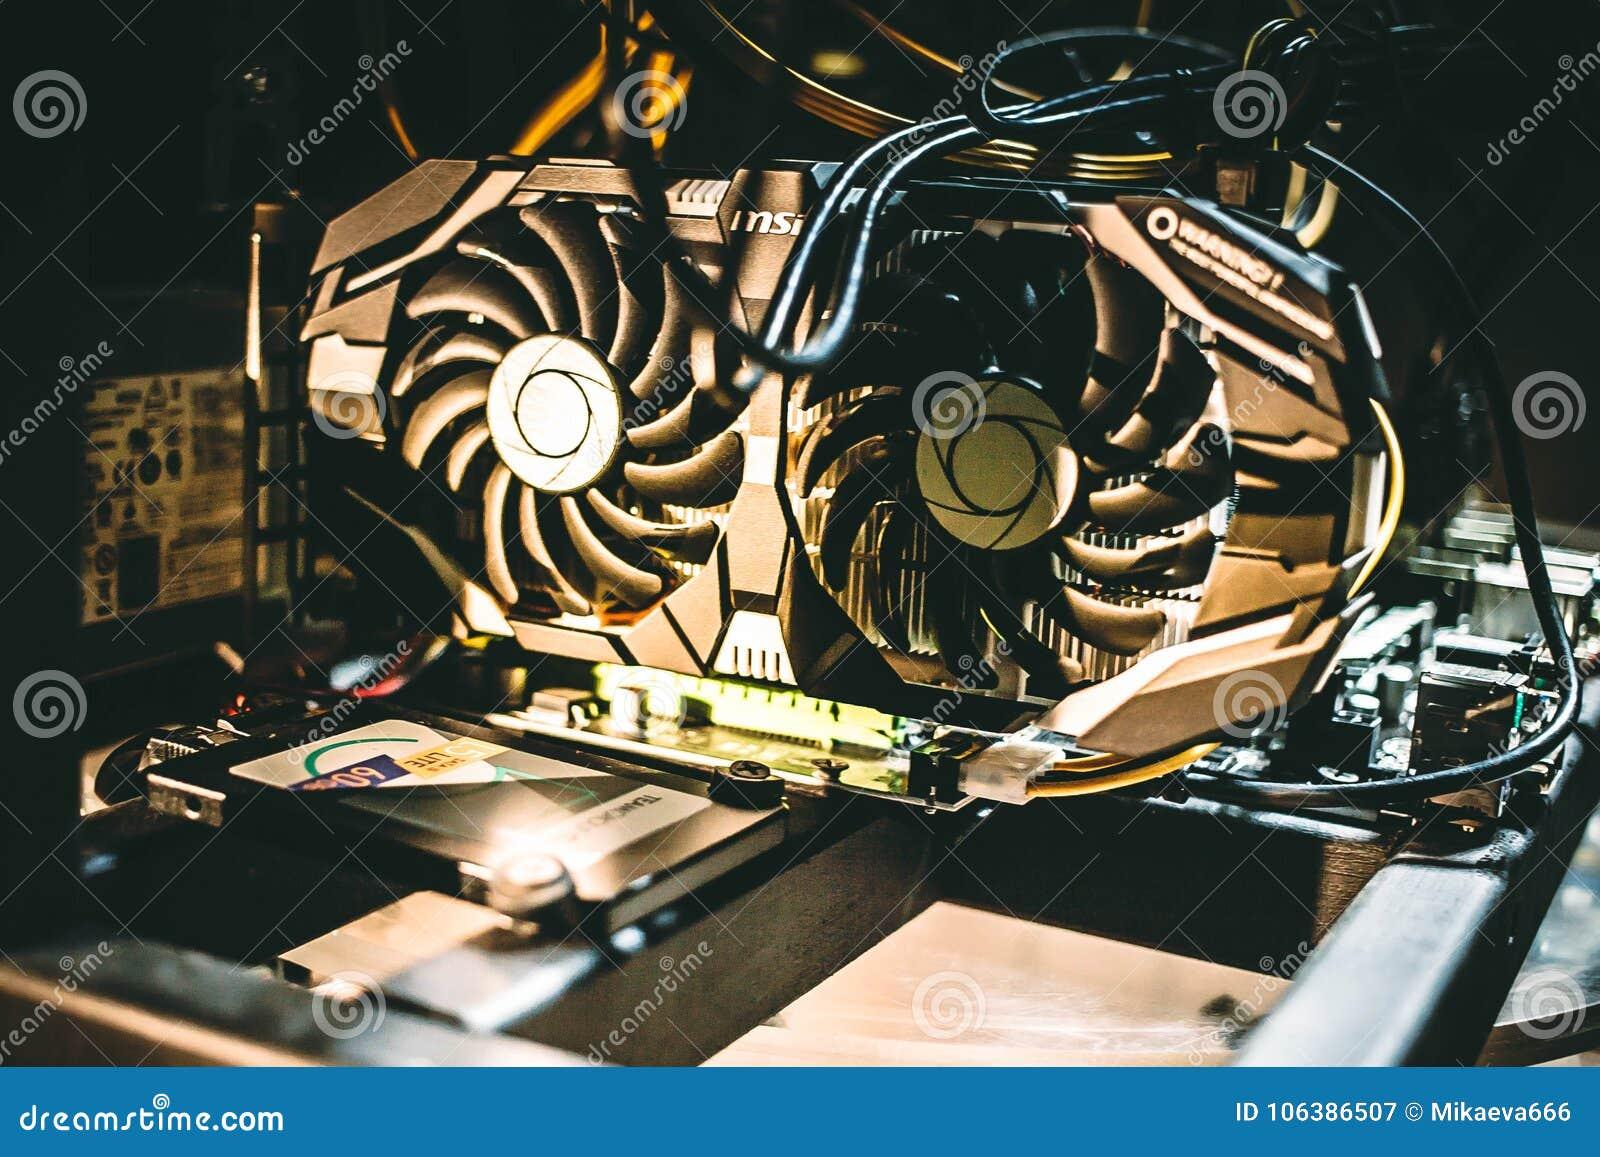 bitcoin extraction machine